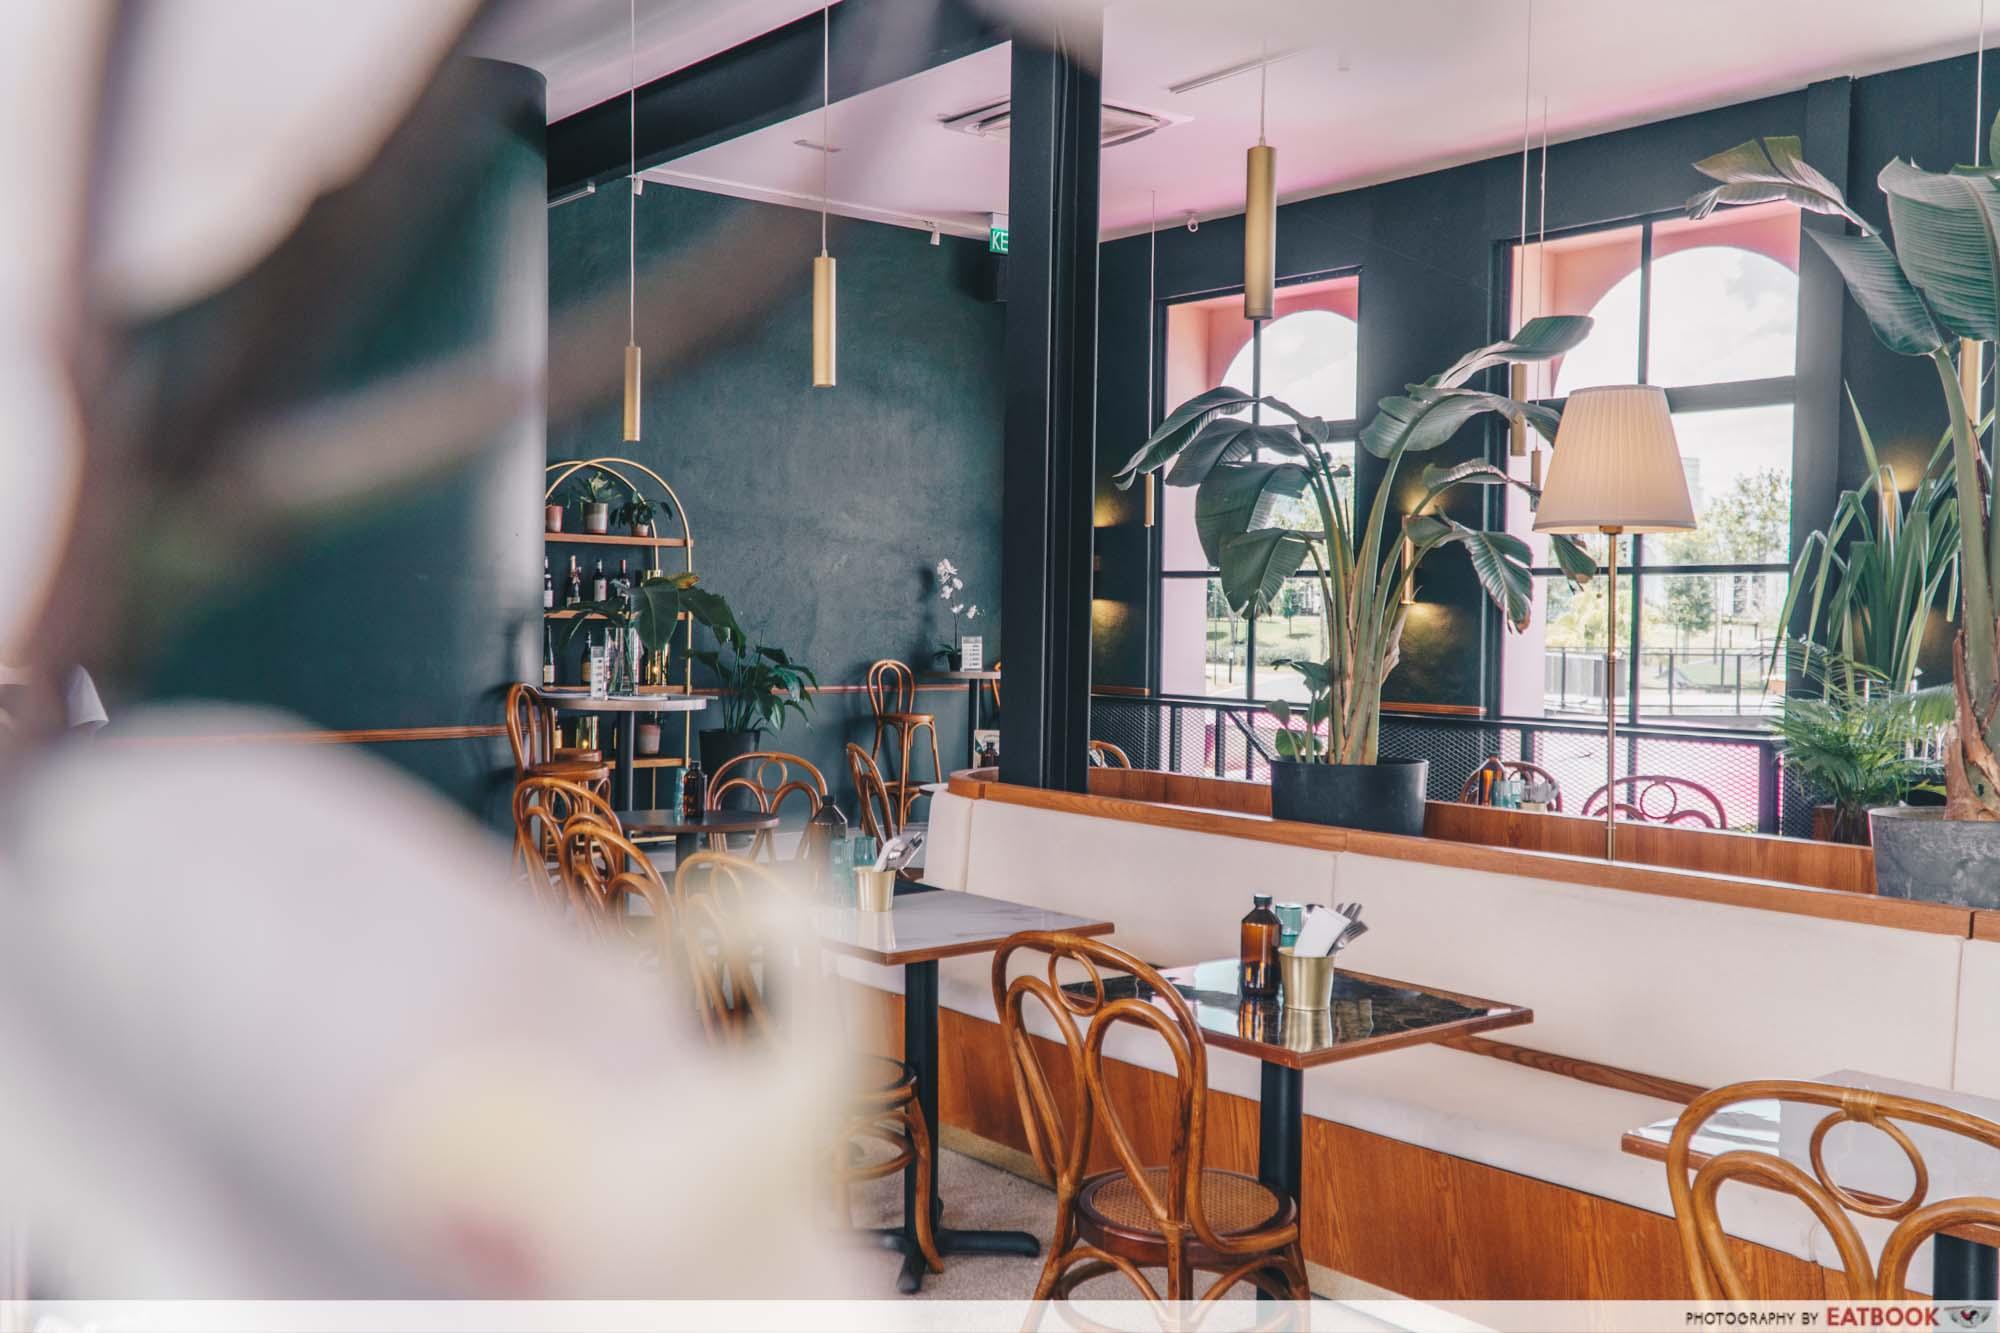 JB Mount Austin Food - Tropique Café & Restaurant